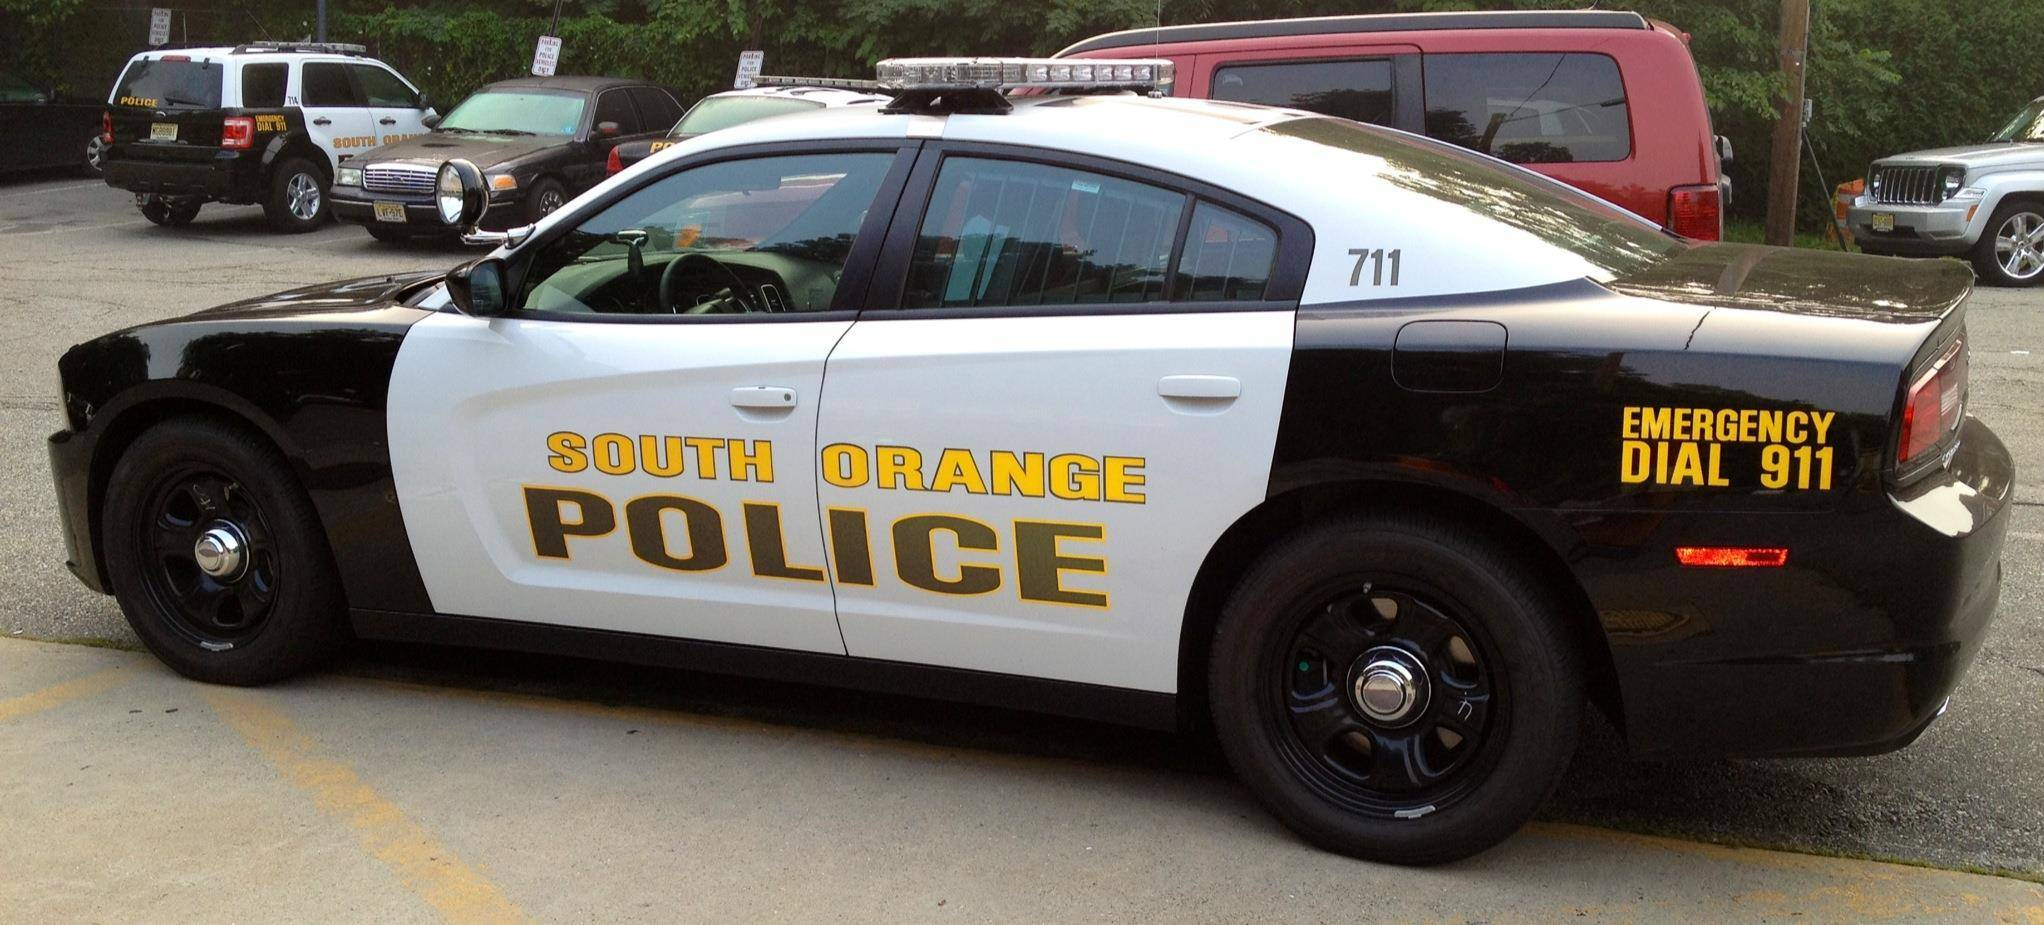 a048d9b78a0c4d38f71a_south_orange_police.jpg